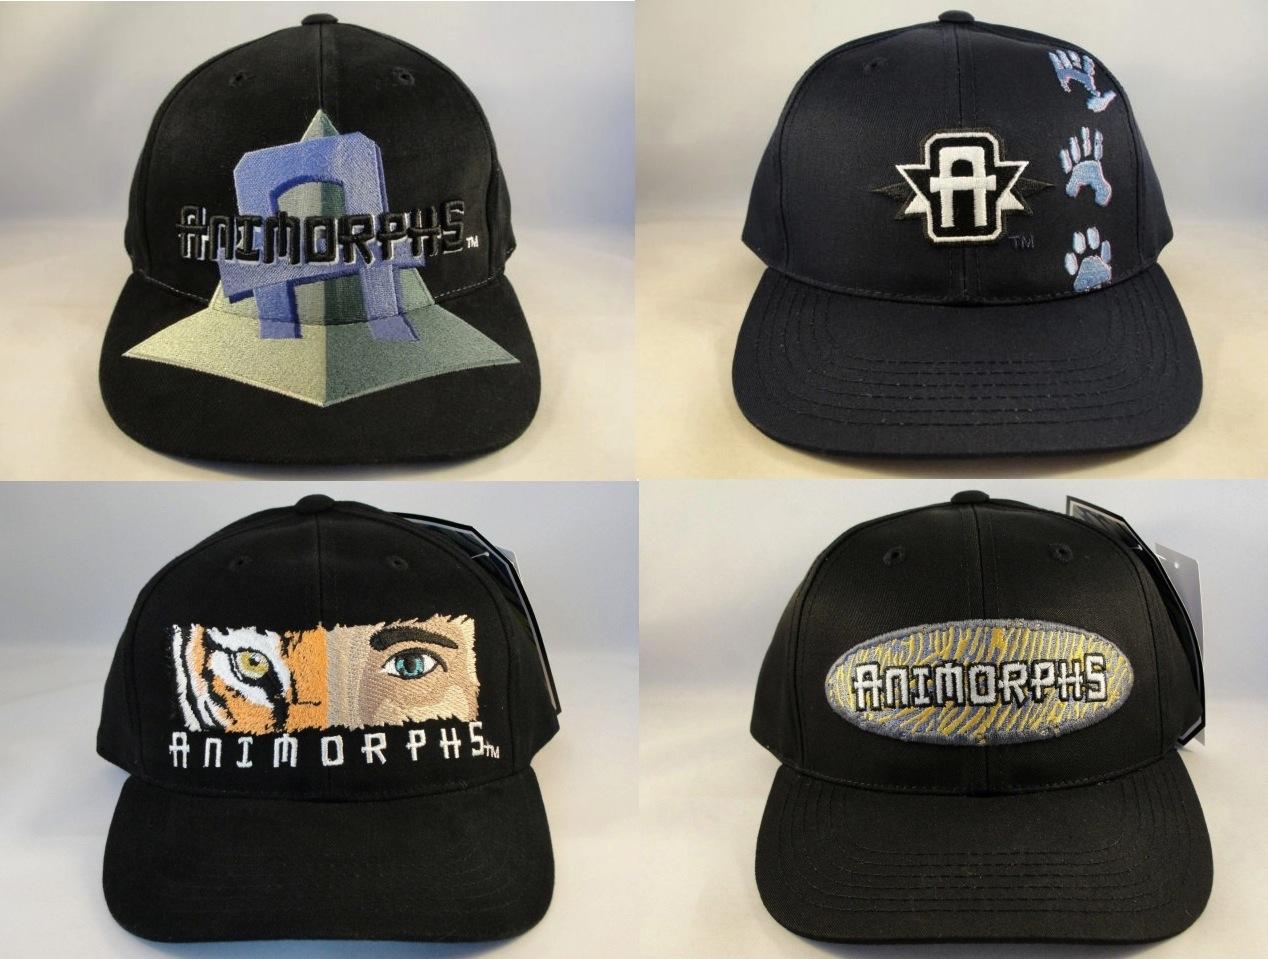 American Needle Baseball Caps